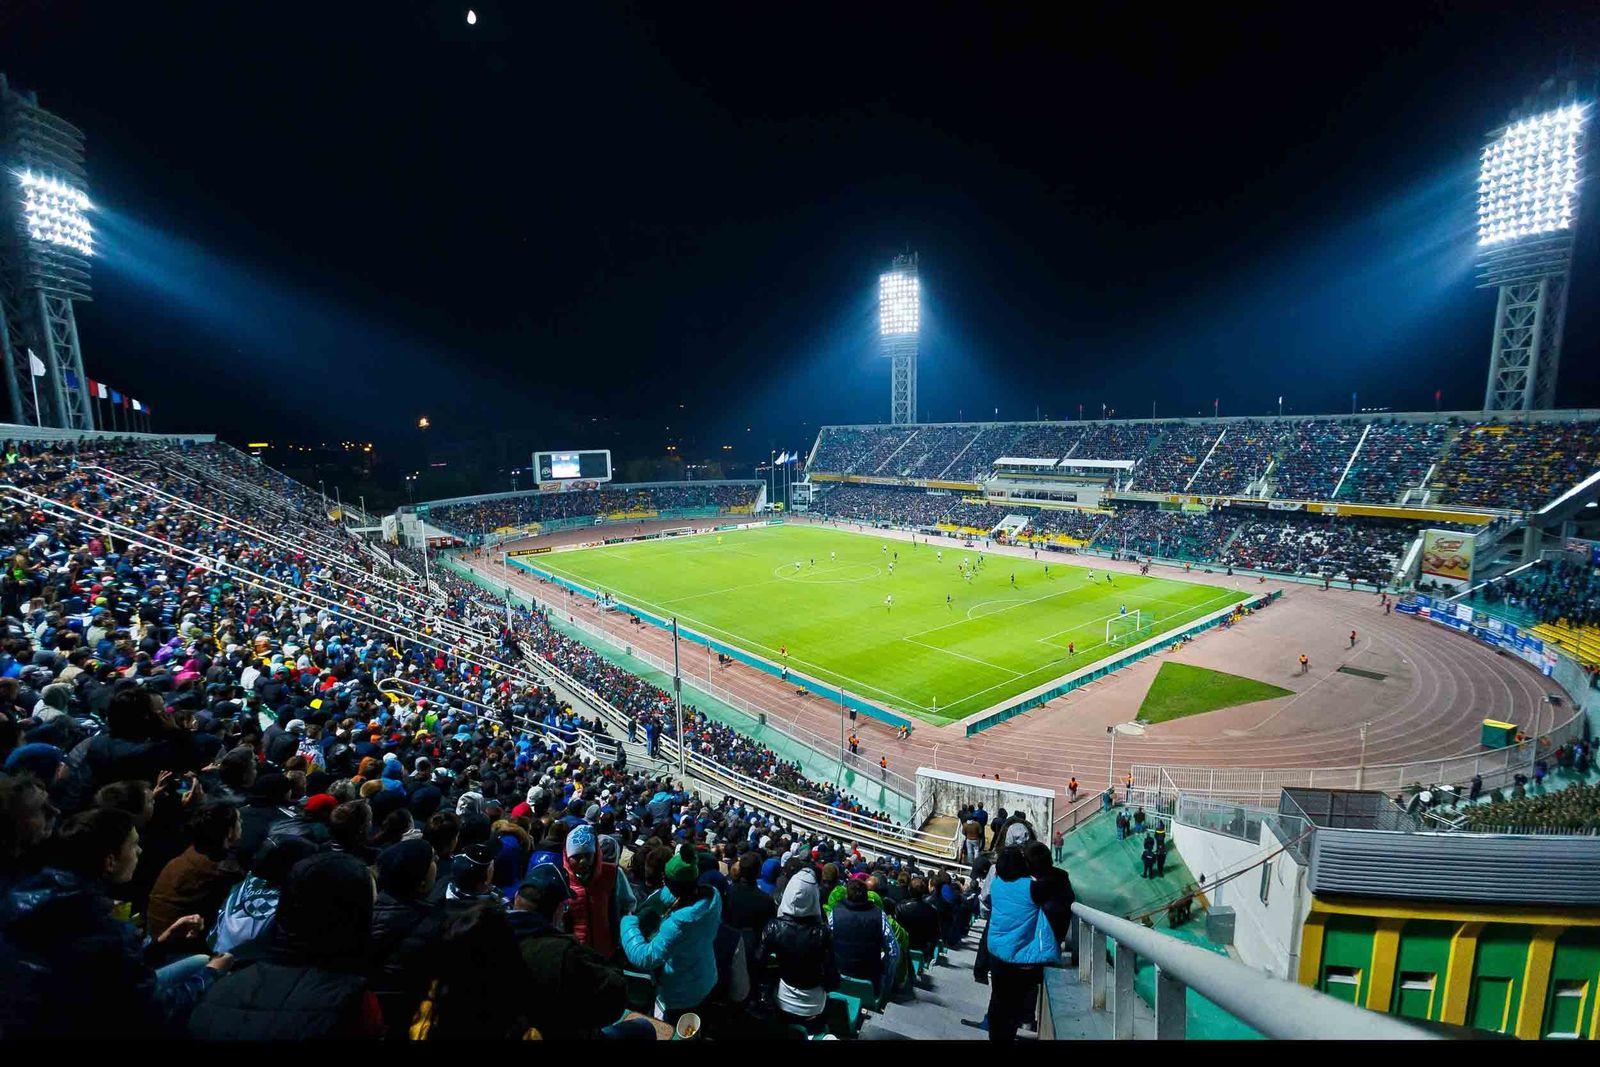 Stadium Kuban in Krasnodar: history of creation and reconstruction